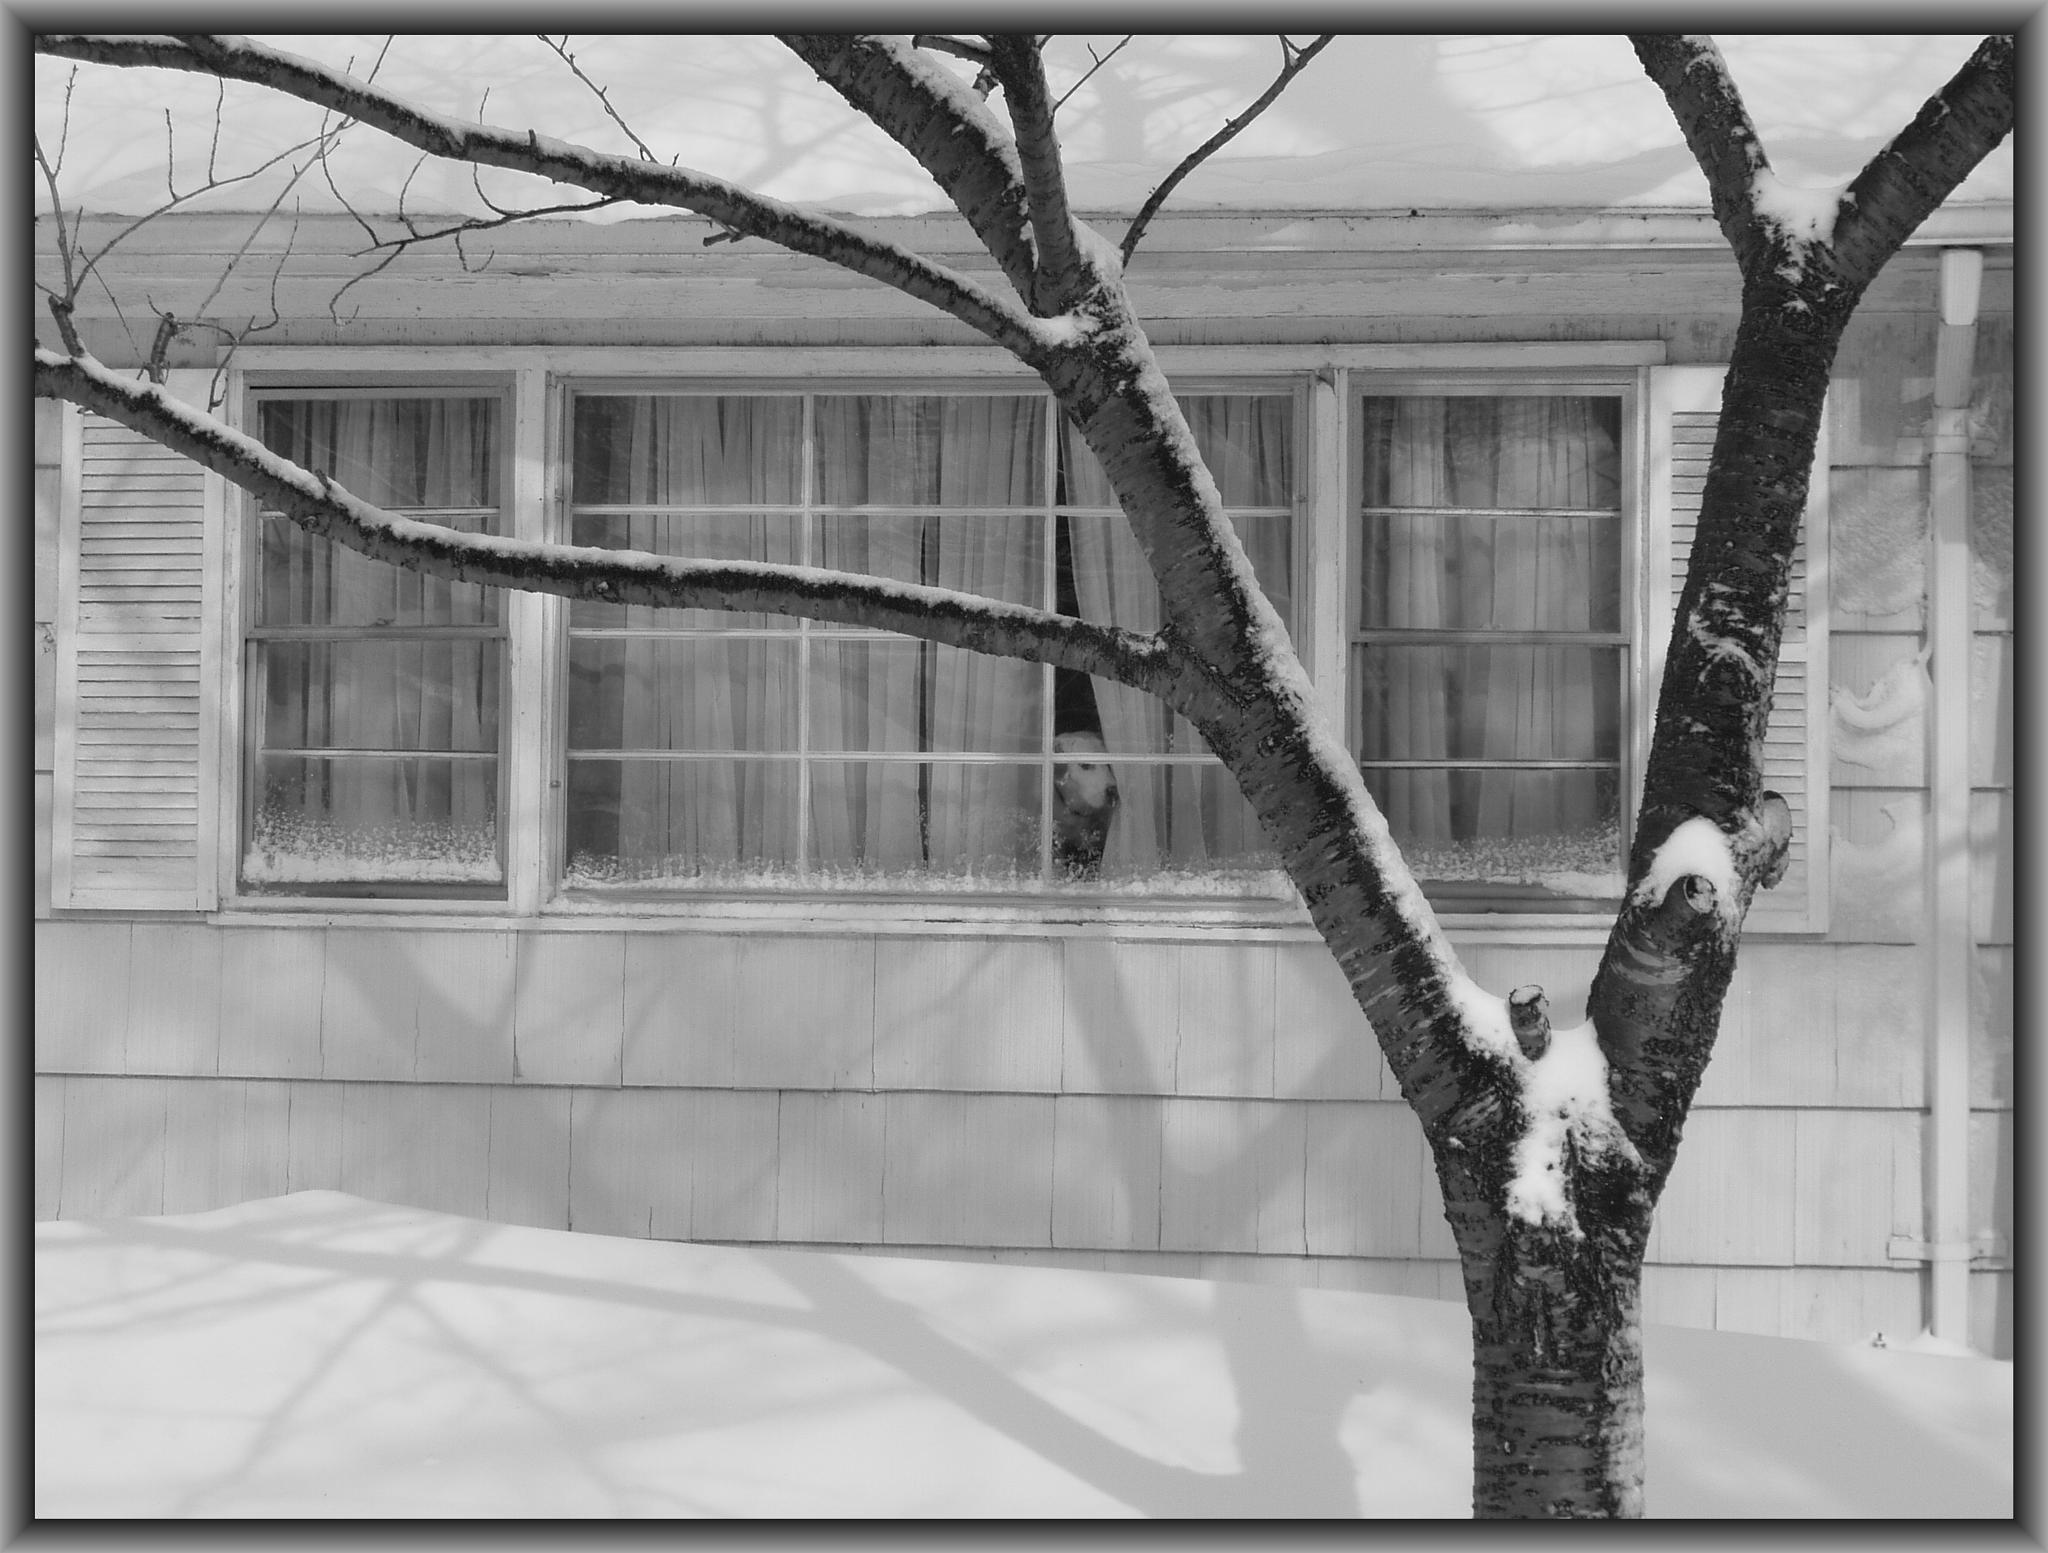 Molly in the Window 3 by M. R. Warner